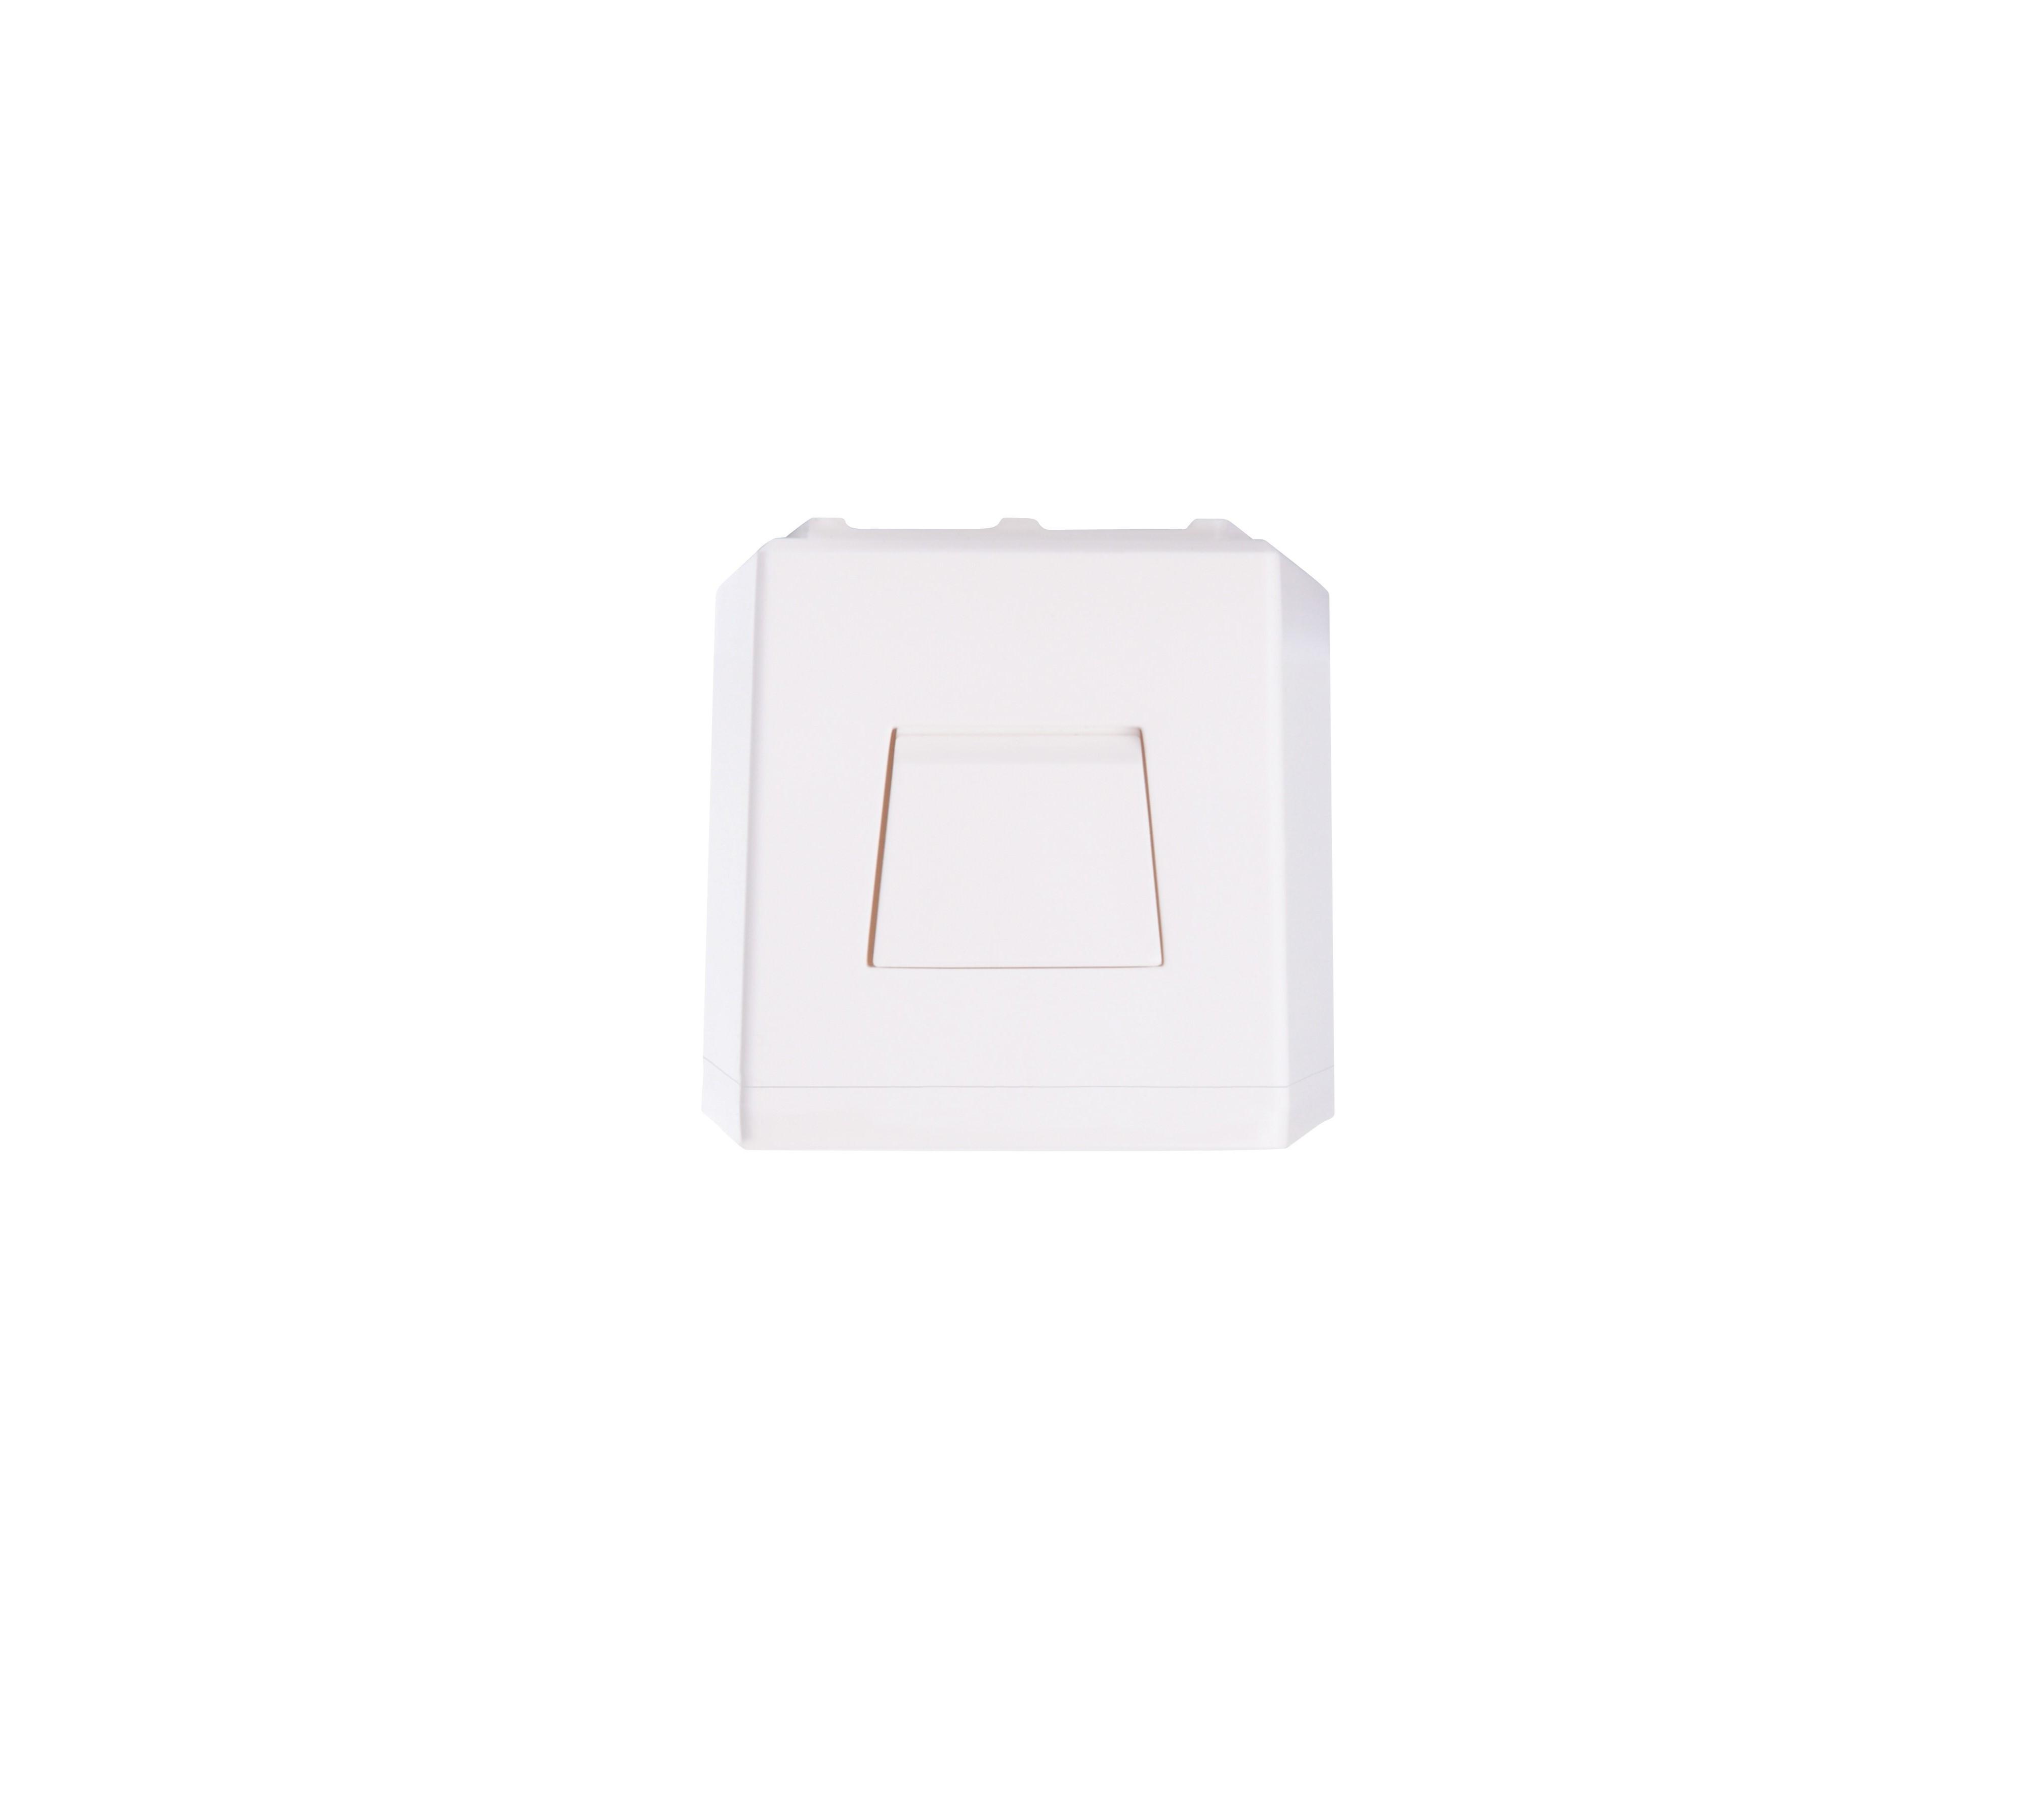 Lampa emergenta led Intelight 94767   3h nementinut test automat 1